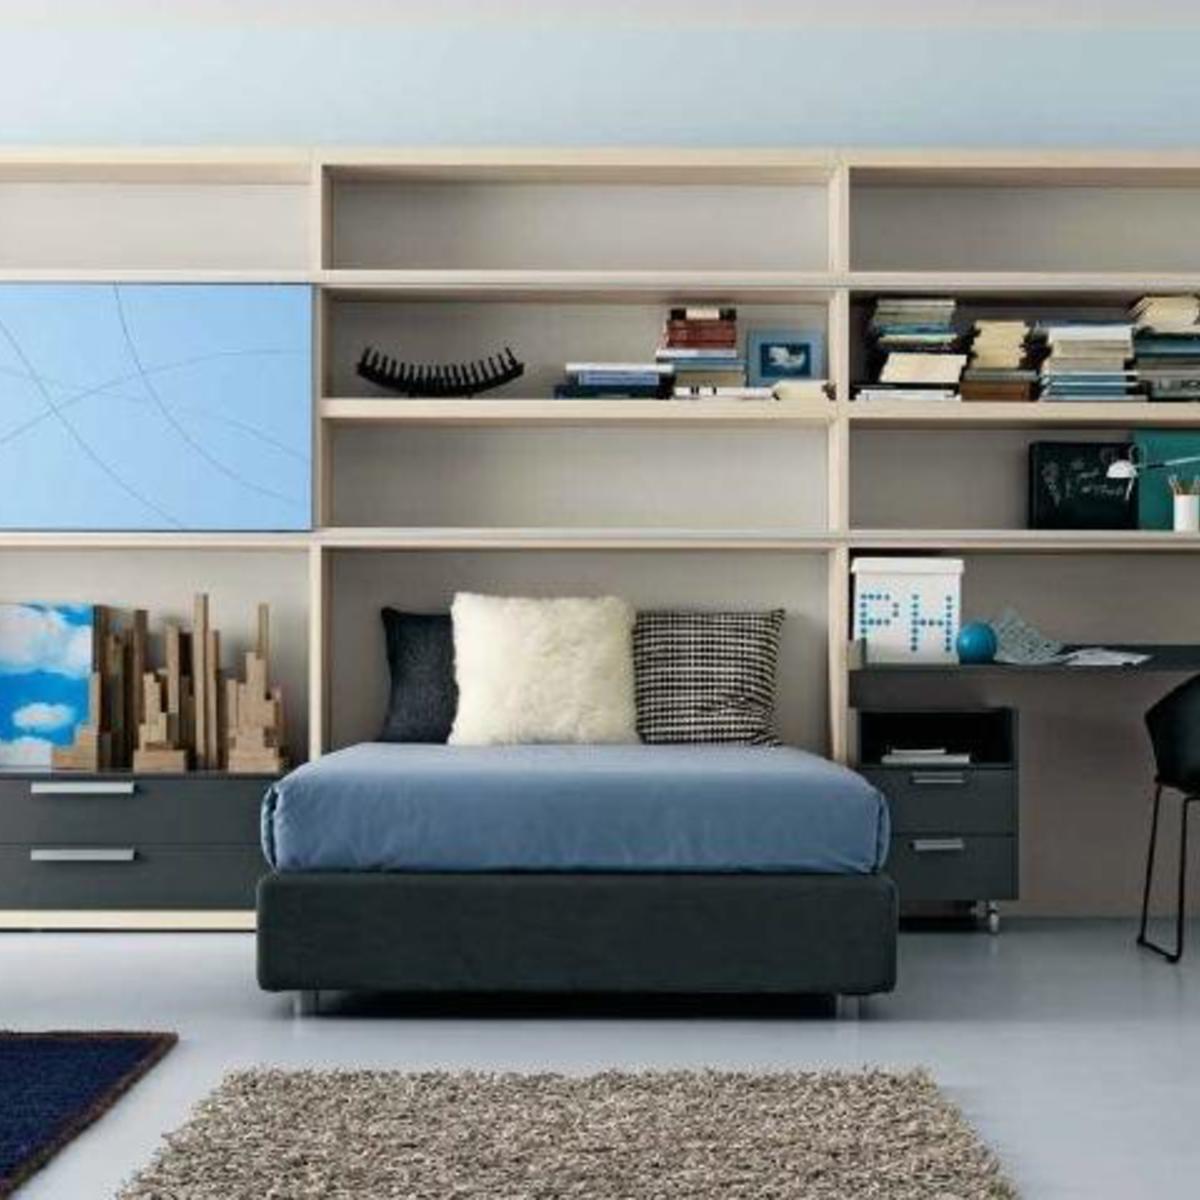 Robinson Blue  Ottoman bed